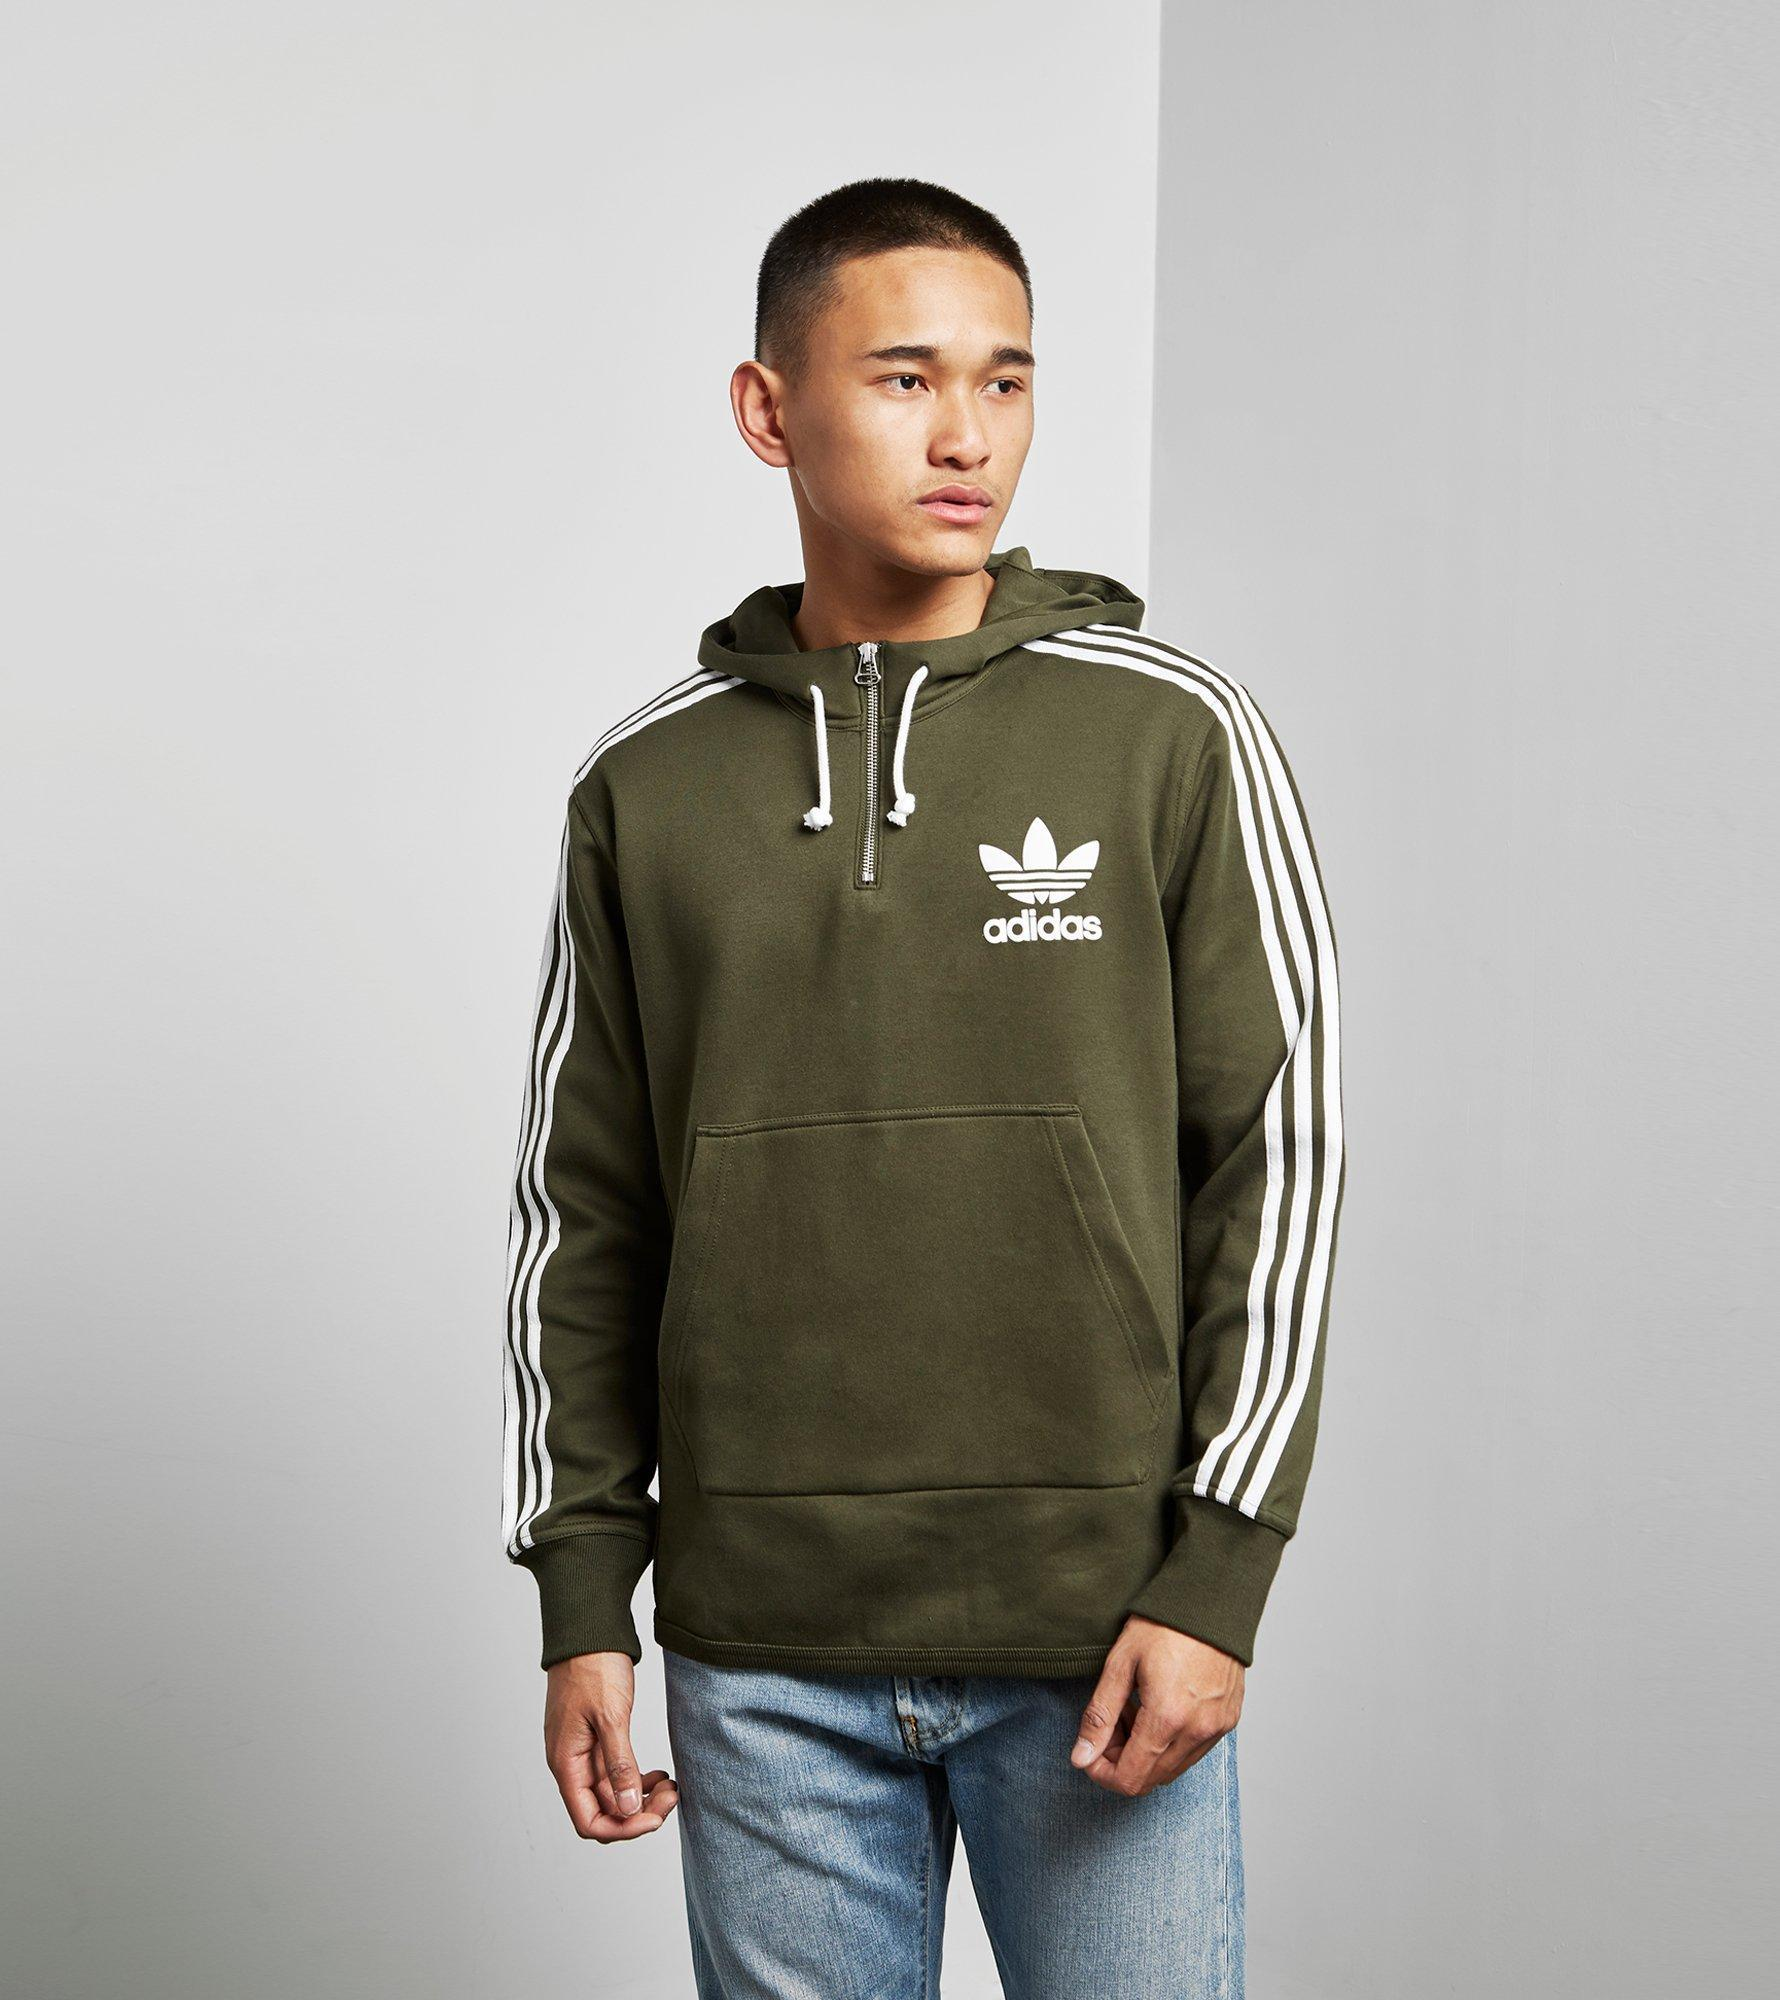 Lyst Adidas Originals Adc Half zip Con capucha zip capucha Tamaño Exclusivo Exclusivo en 068c5d7 - sulfasalazisalaz.website